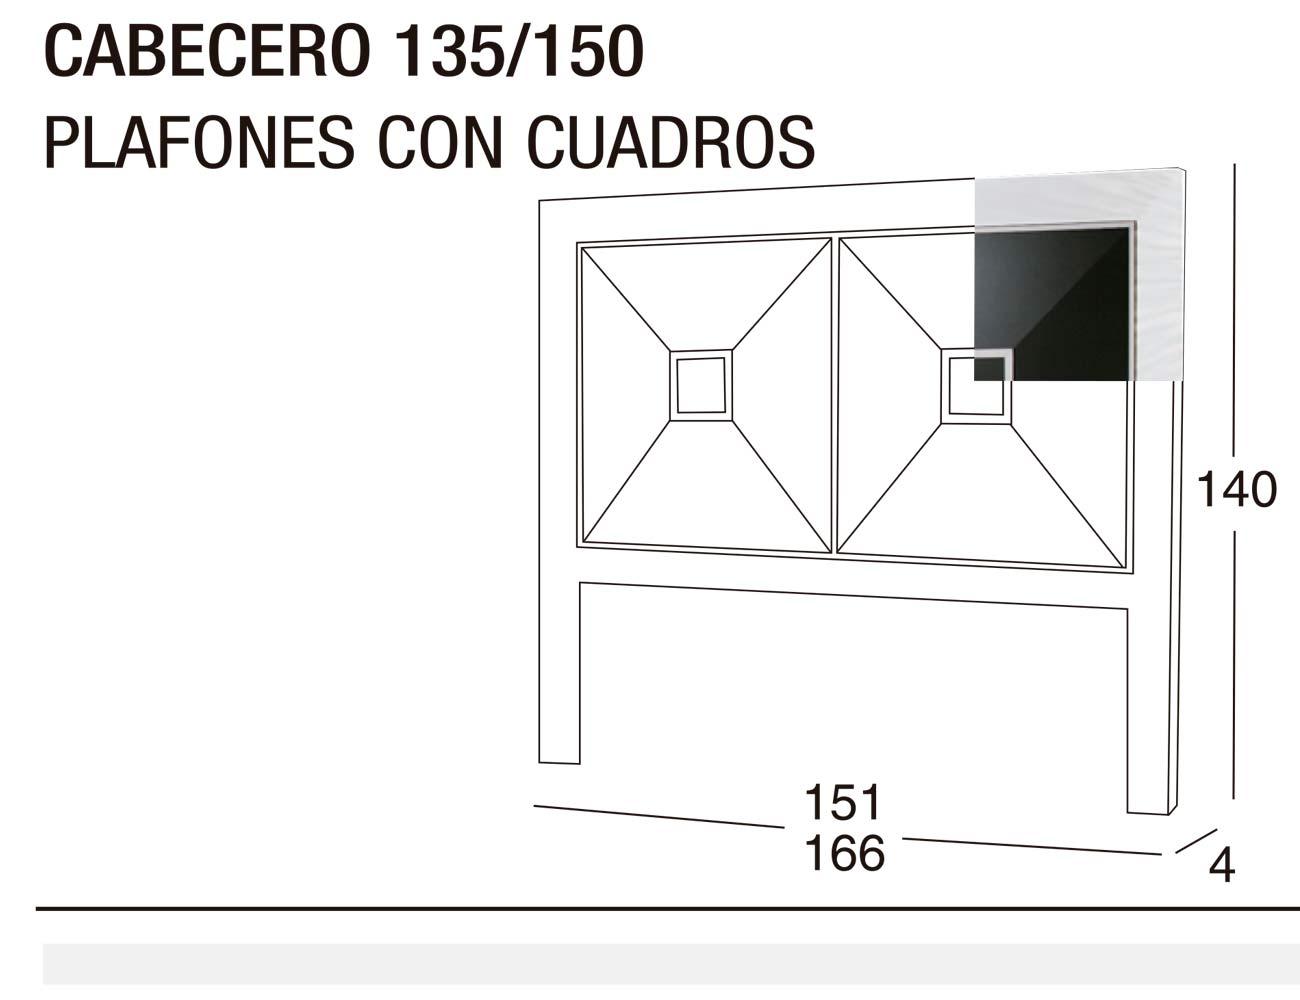 Cabecero 135x150 plafon cuadros